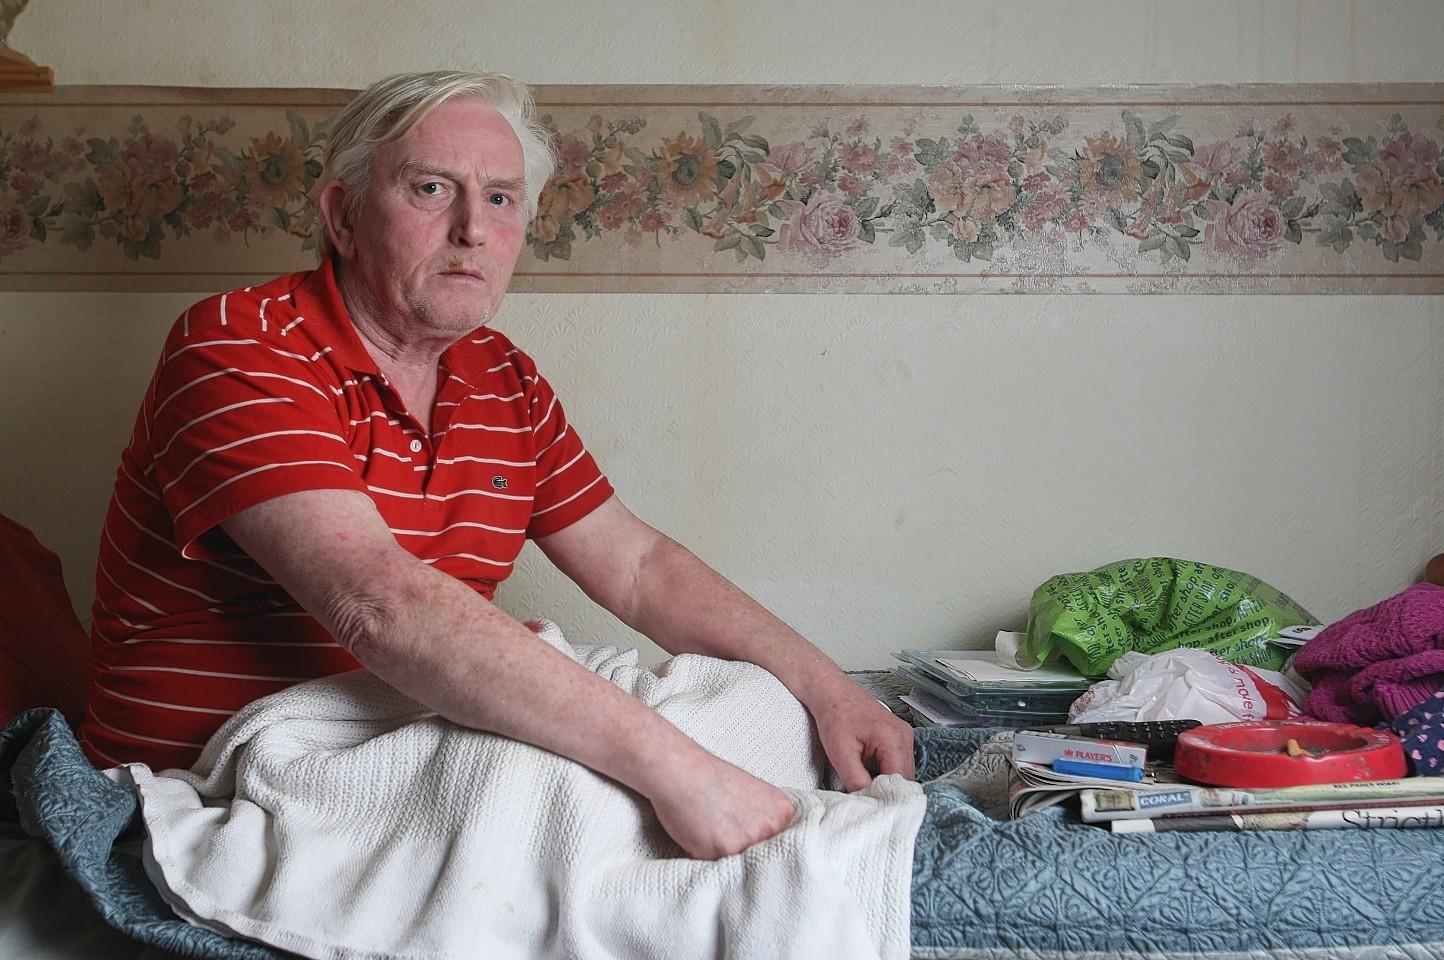 Tom Burns, who has had both legs amputated